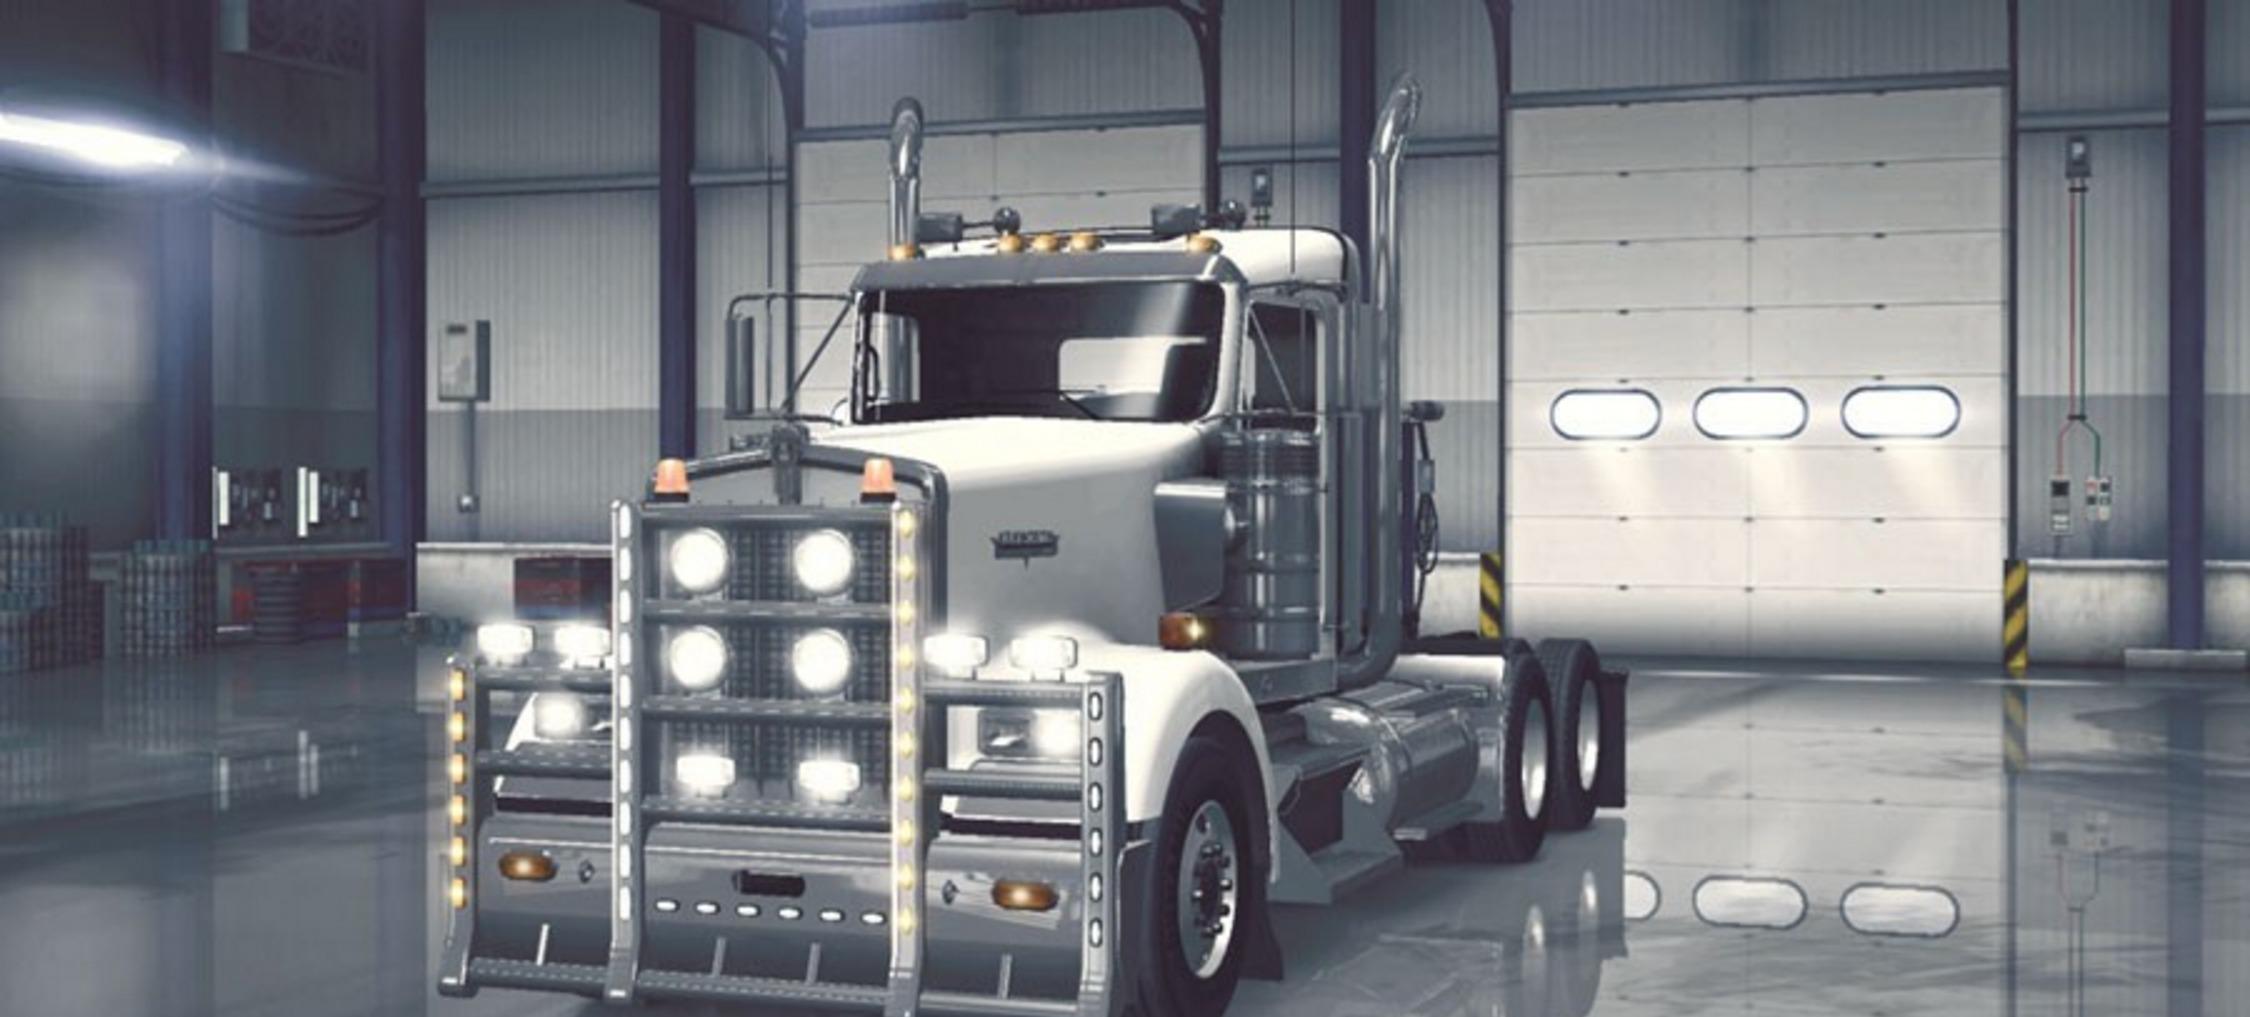 Truck Accessories v 1.1 ATS -Euro Truck Simulator 2 Mods